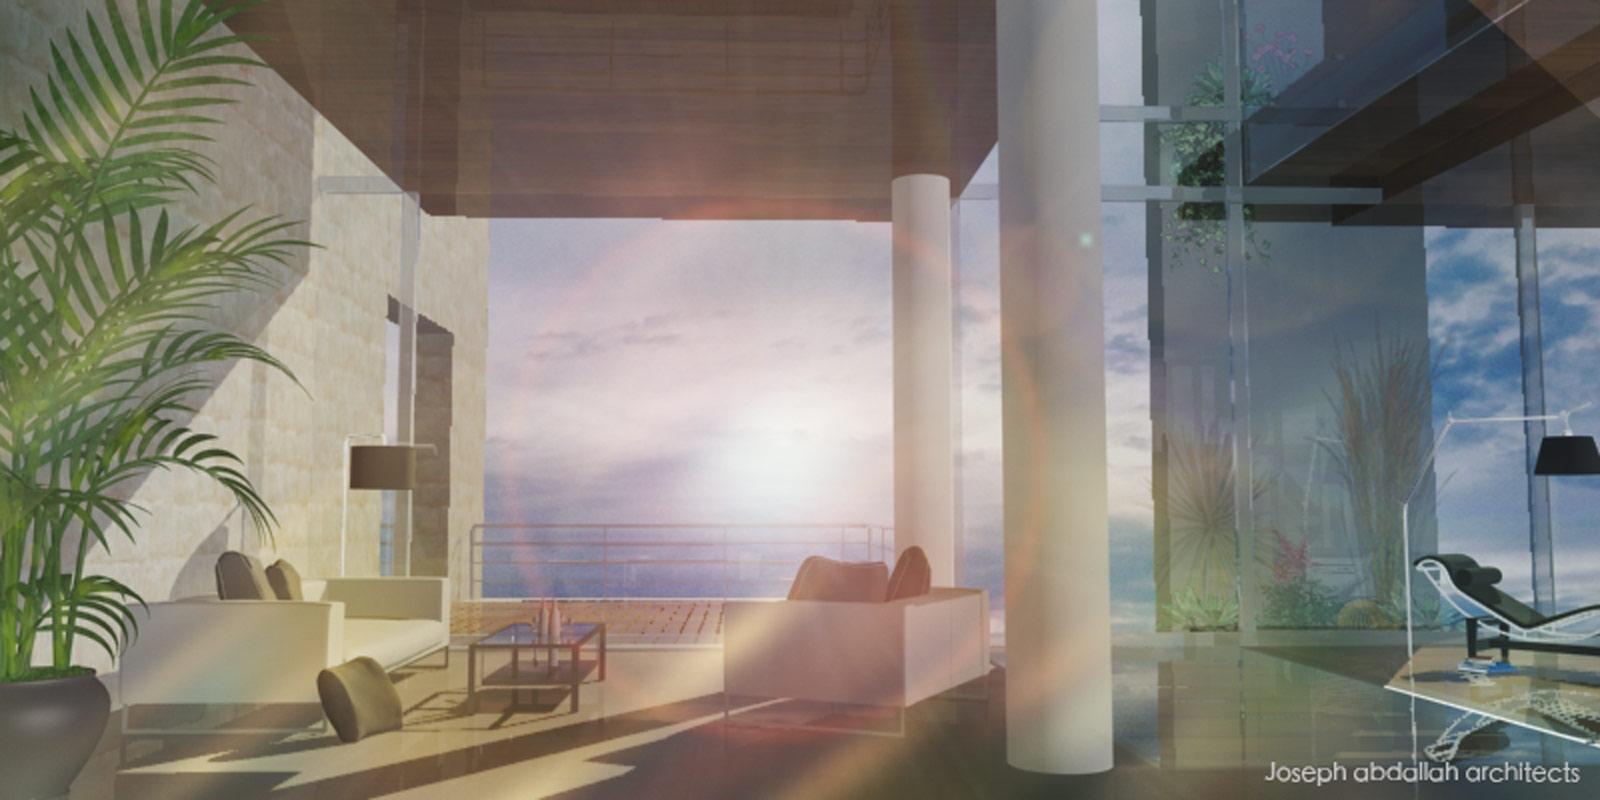 transparent-view-villa-modern-archiecture-joseph-abdallah-architects-4